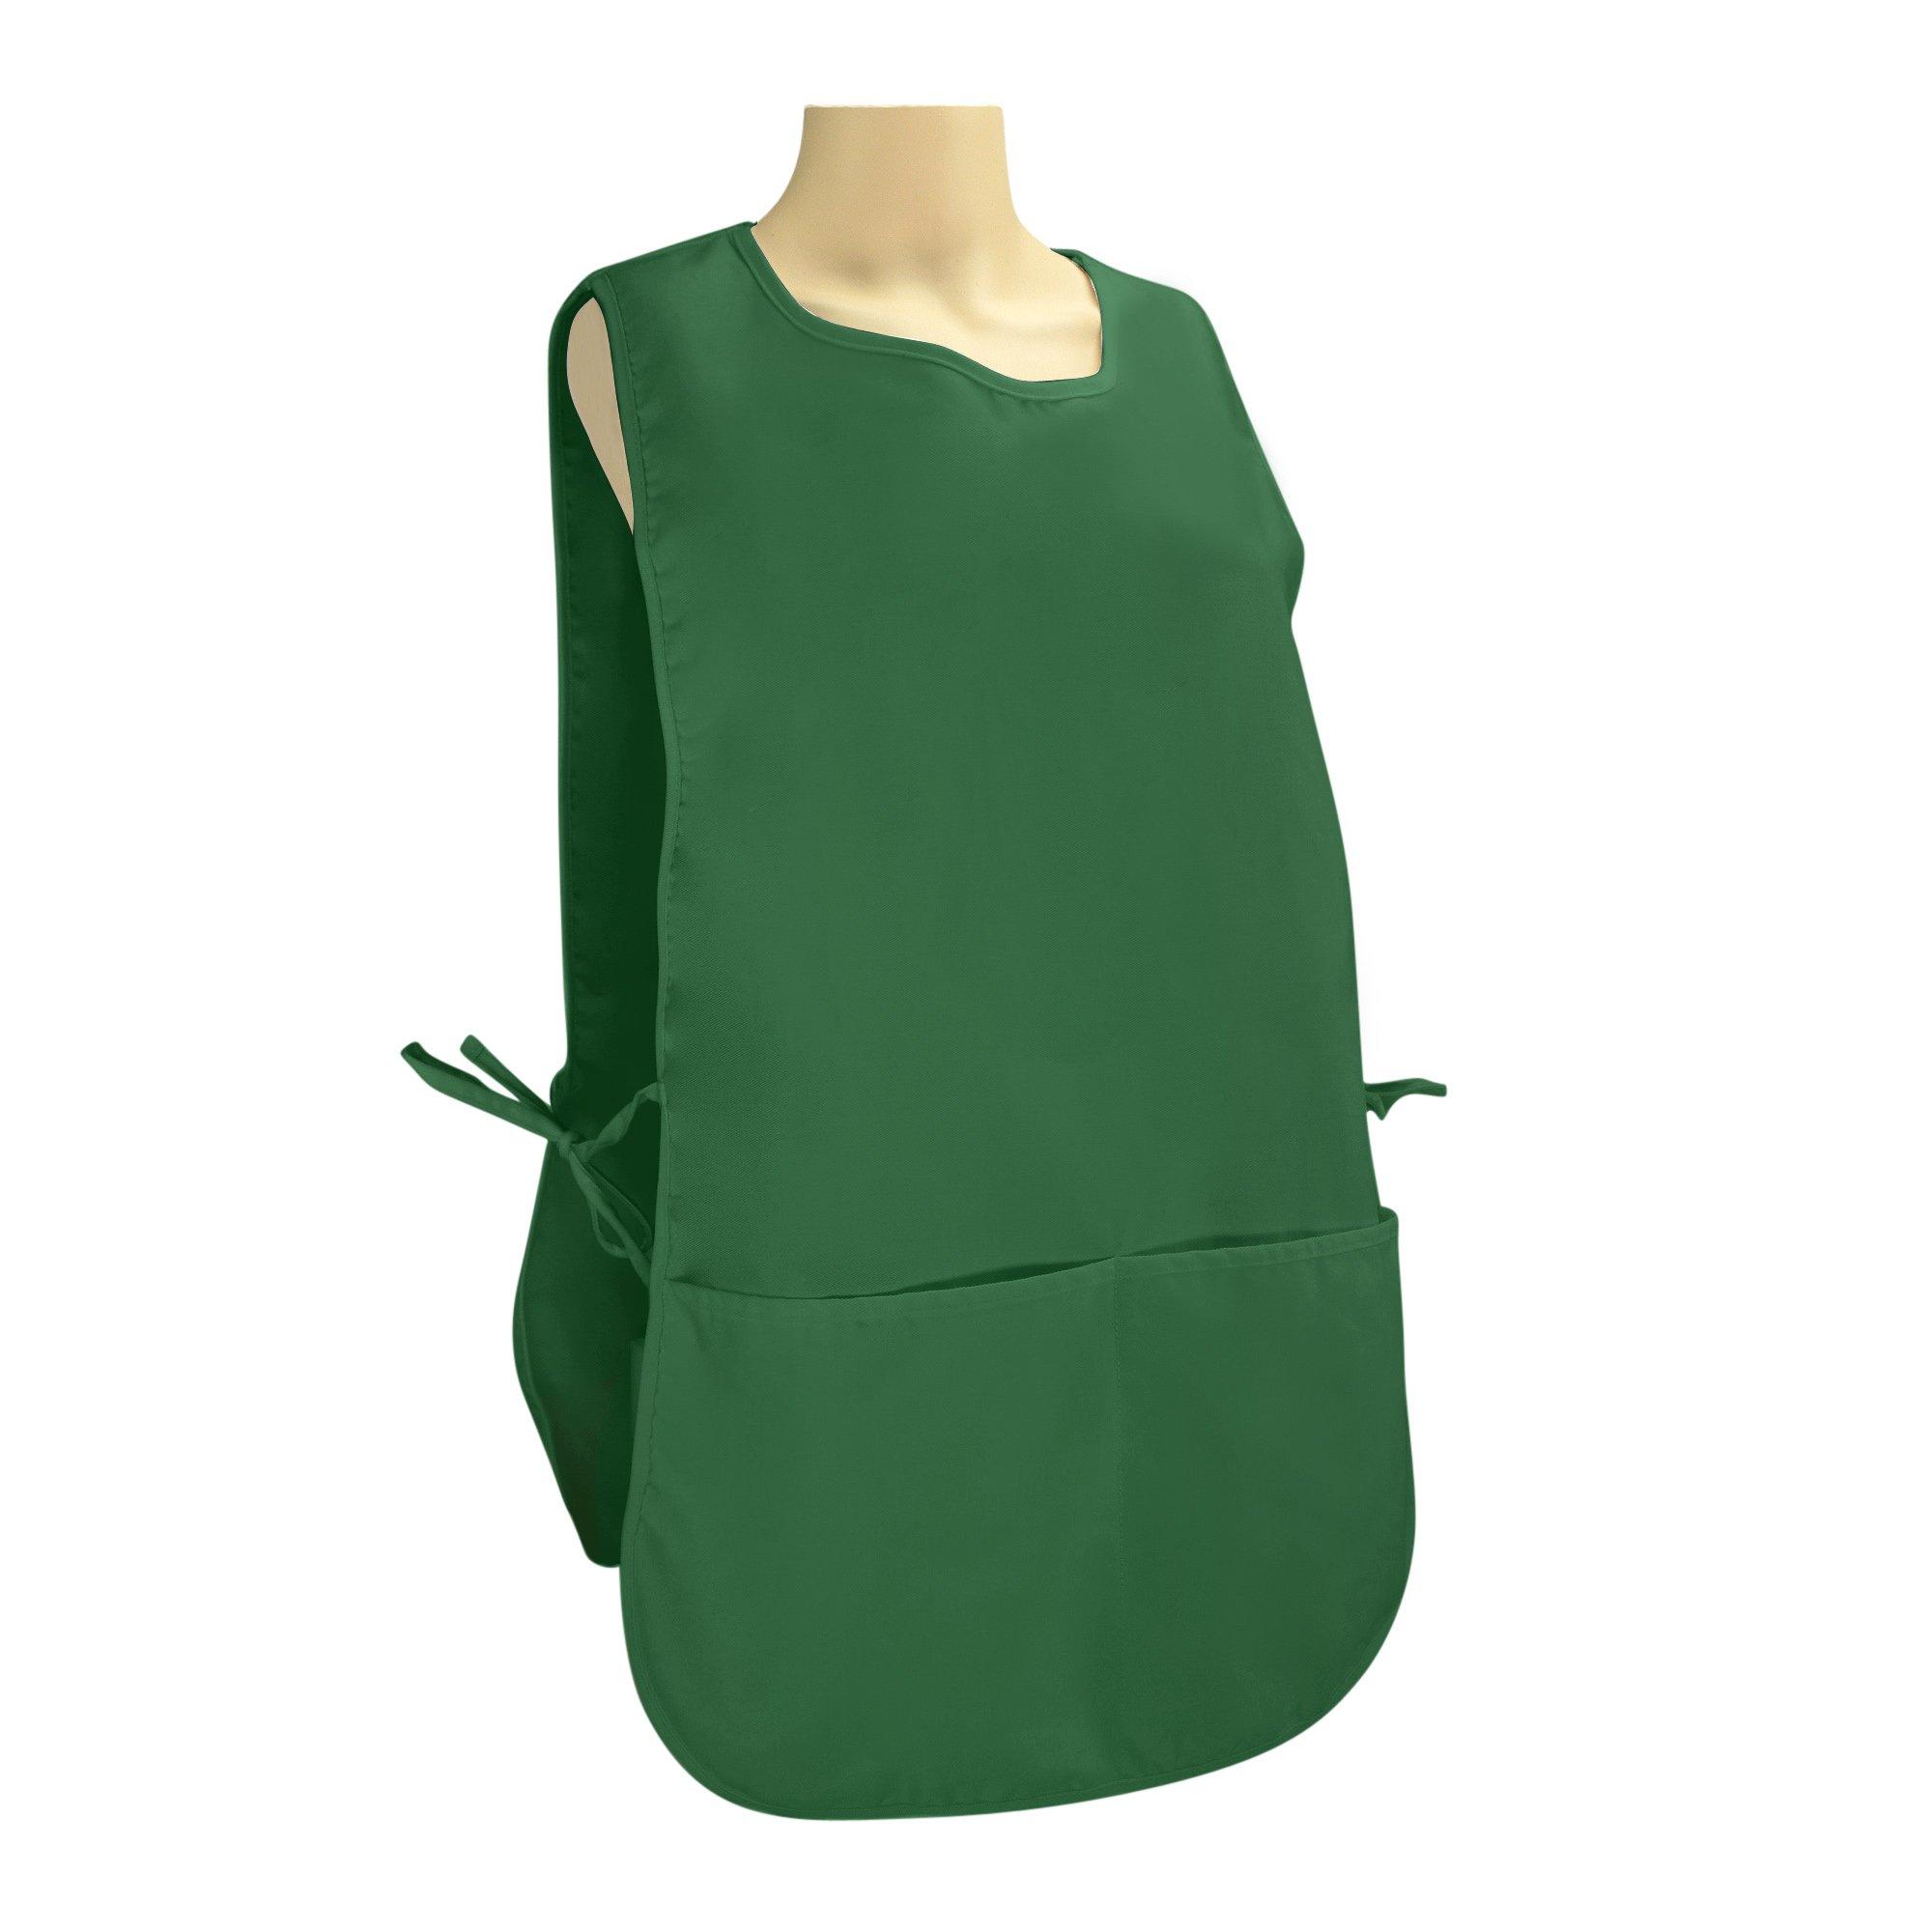 DALIX Cobbler Apron 2 Pockets Smock Regular 28.5'' x 18.5'' Poly Cotton Black White (10, Dark Green) by DALIX